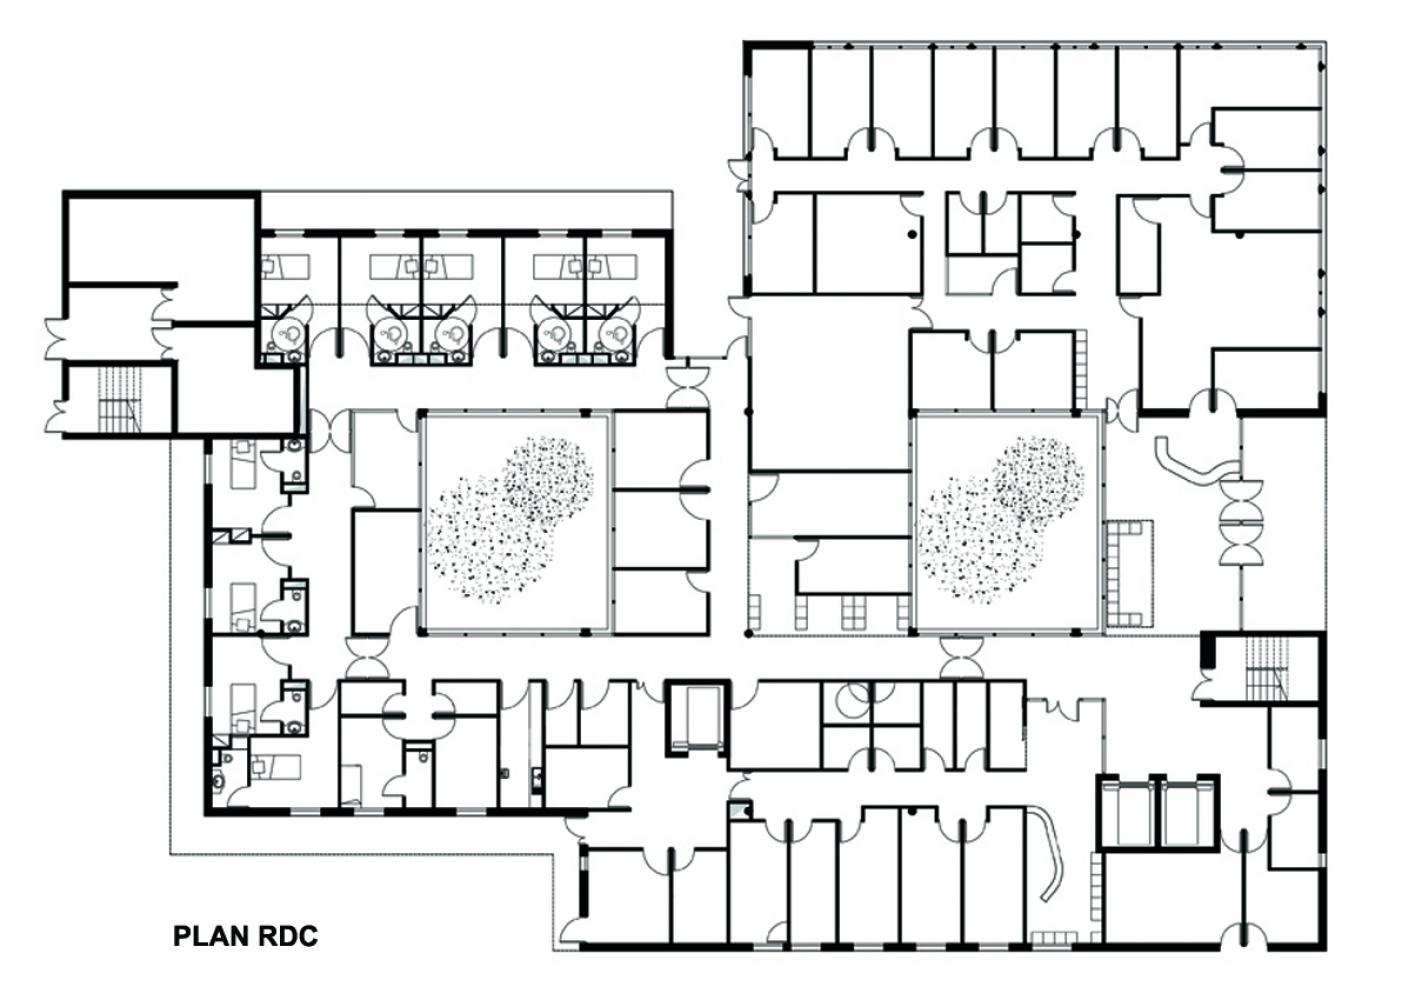 zchr--02 Pascale SEURIN Architecte - Pascale SEURIN Architecte